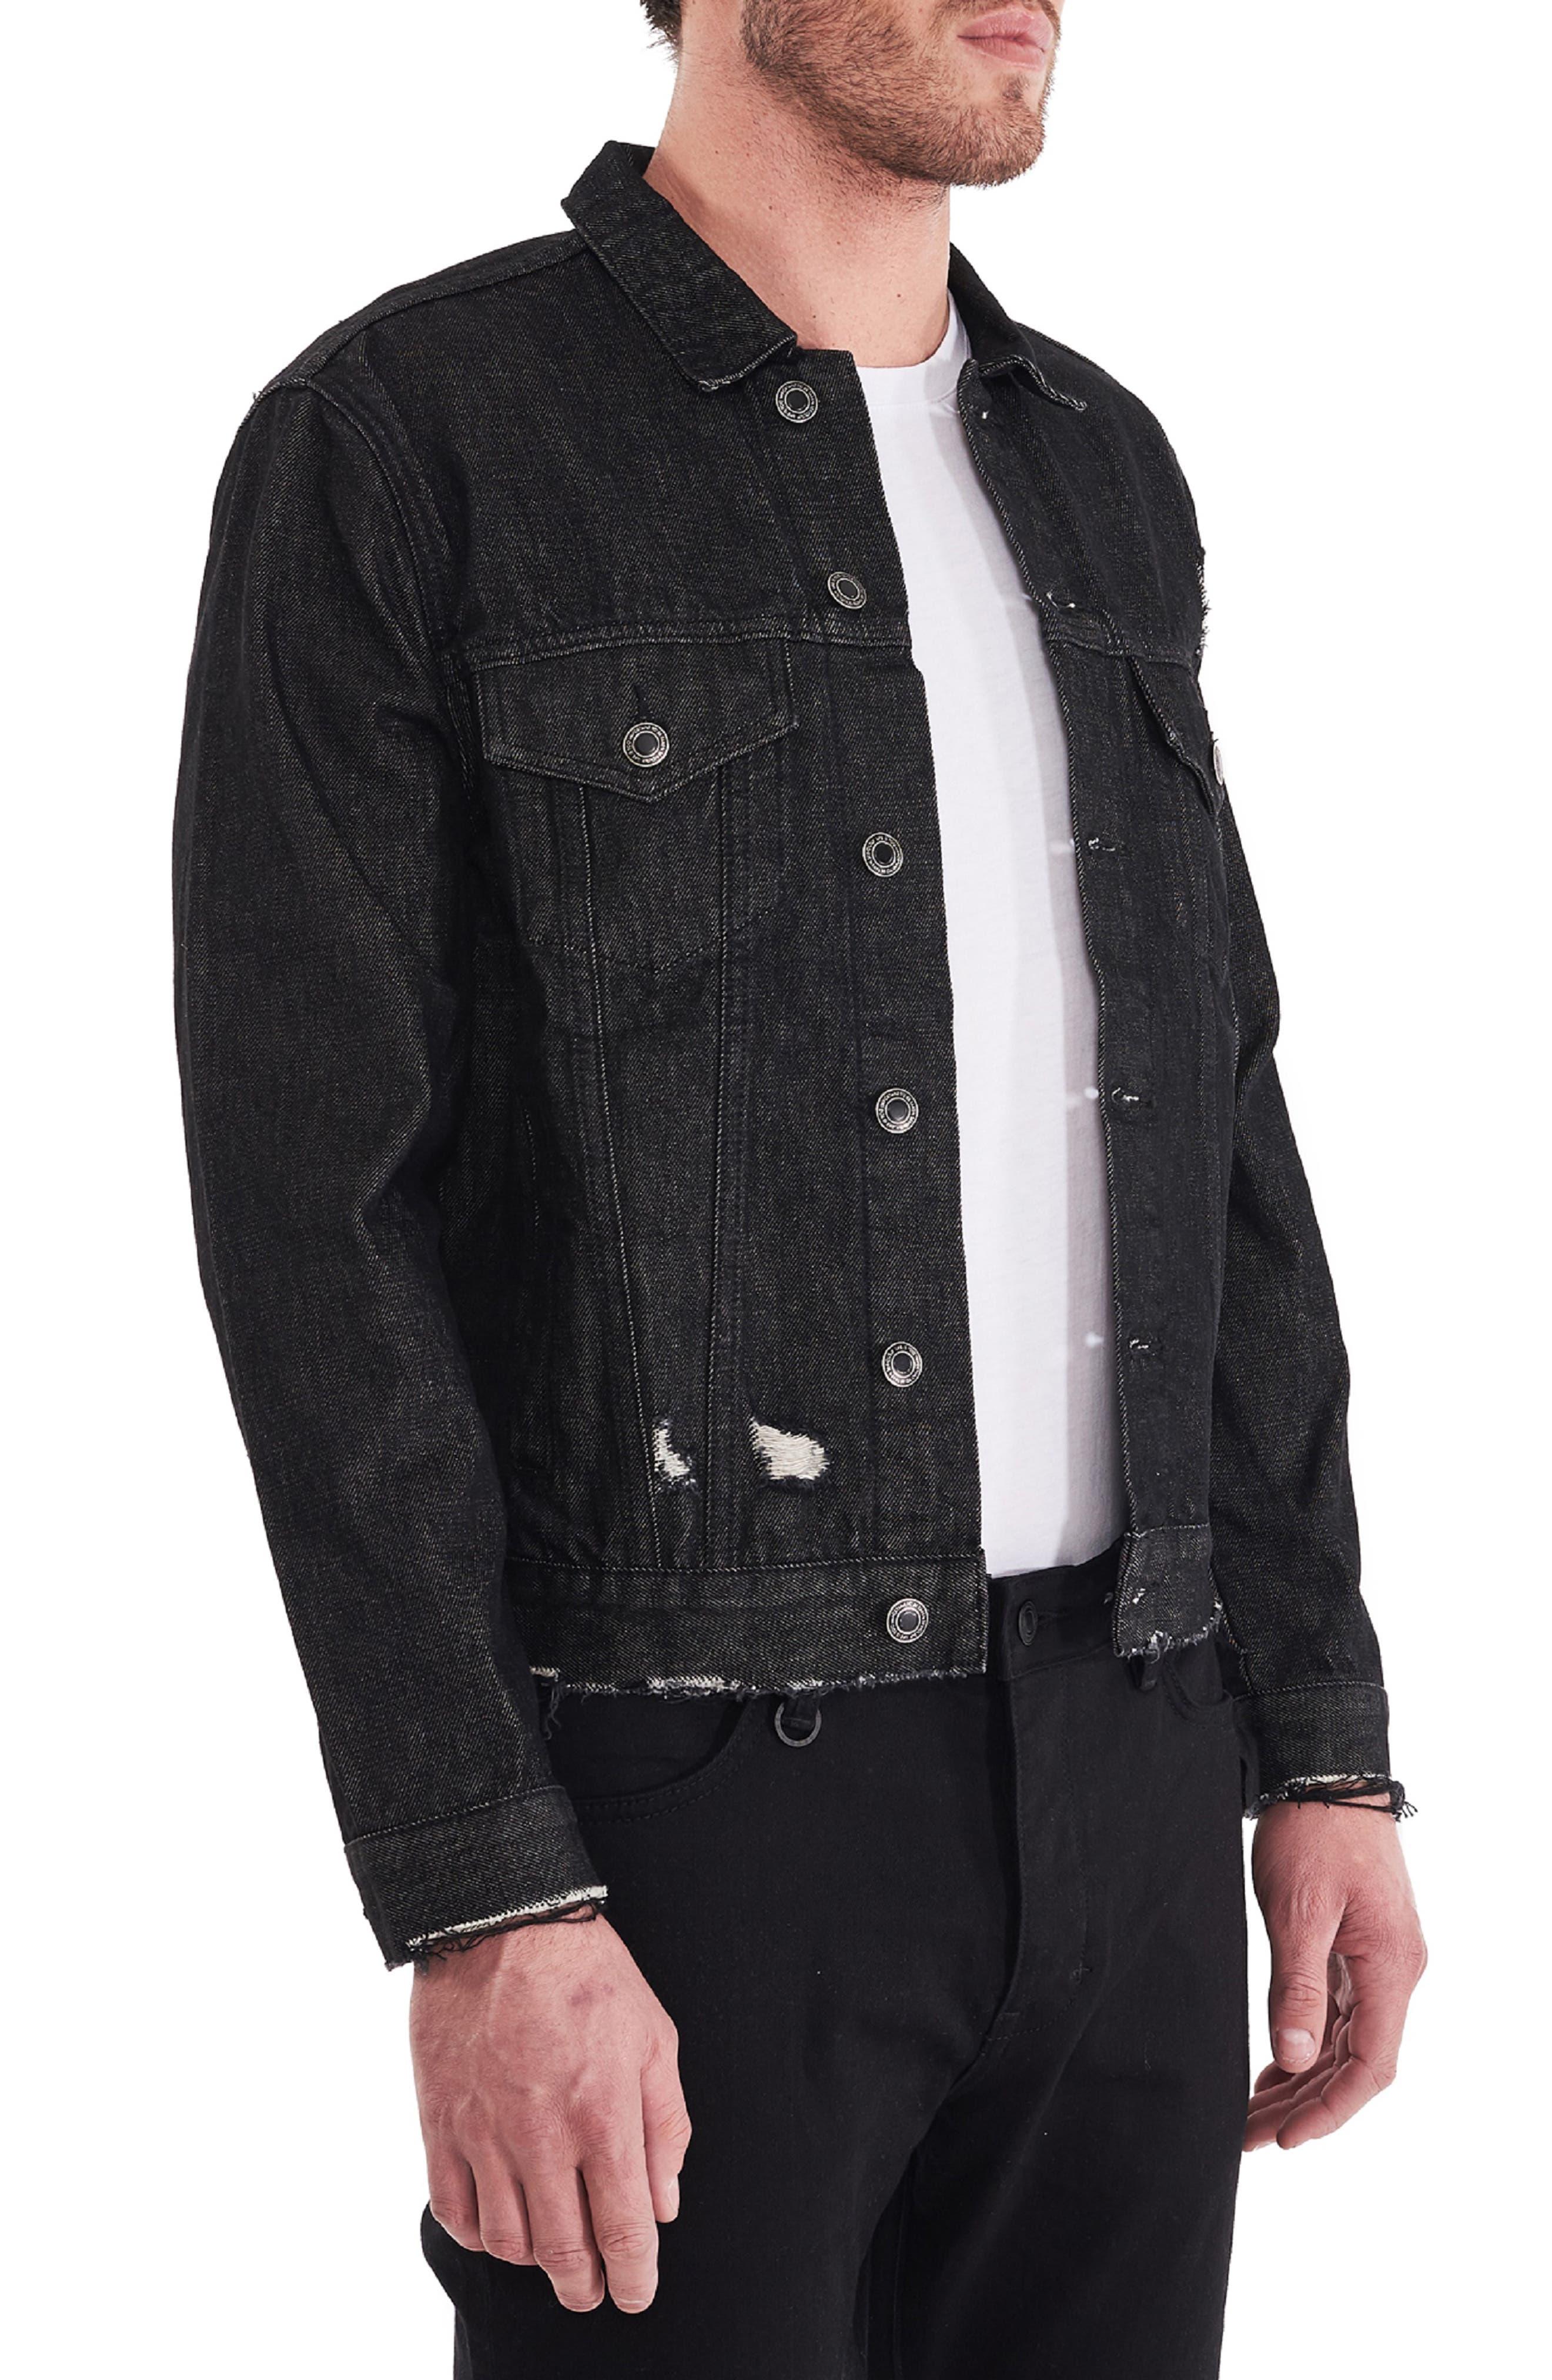 Type One Black Label Denim Jacket,                             Alternate thumbnail 3, color,                             BLACK LABEL